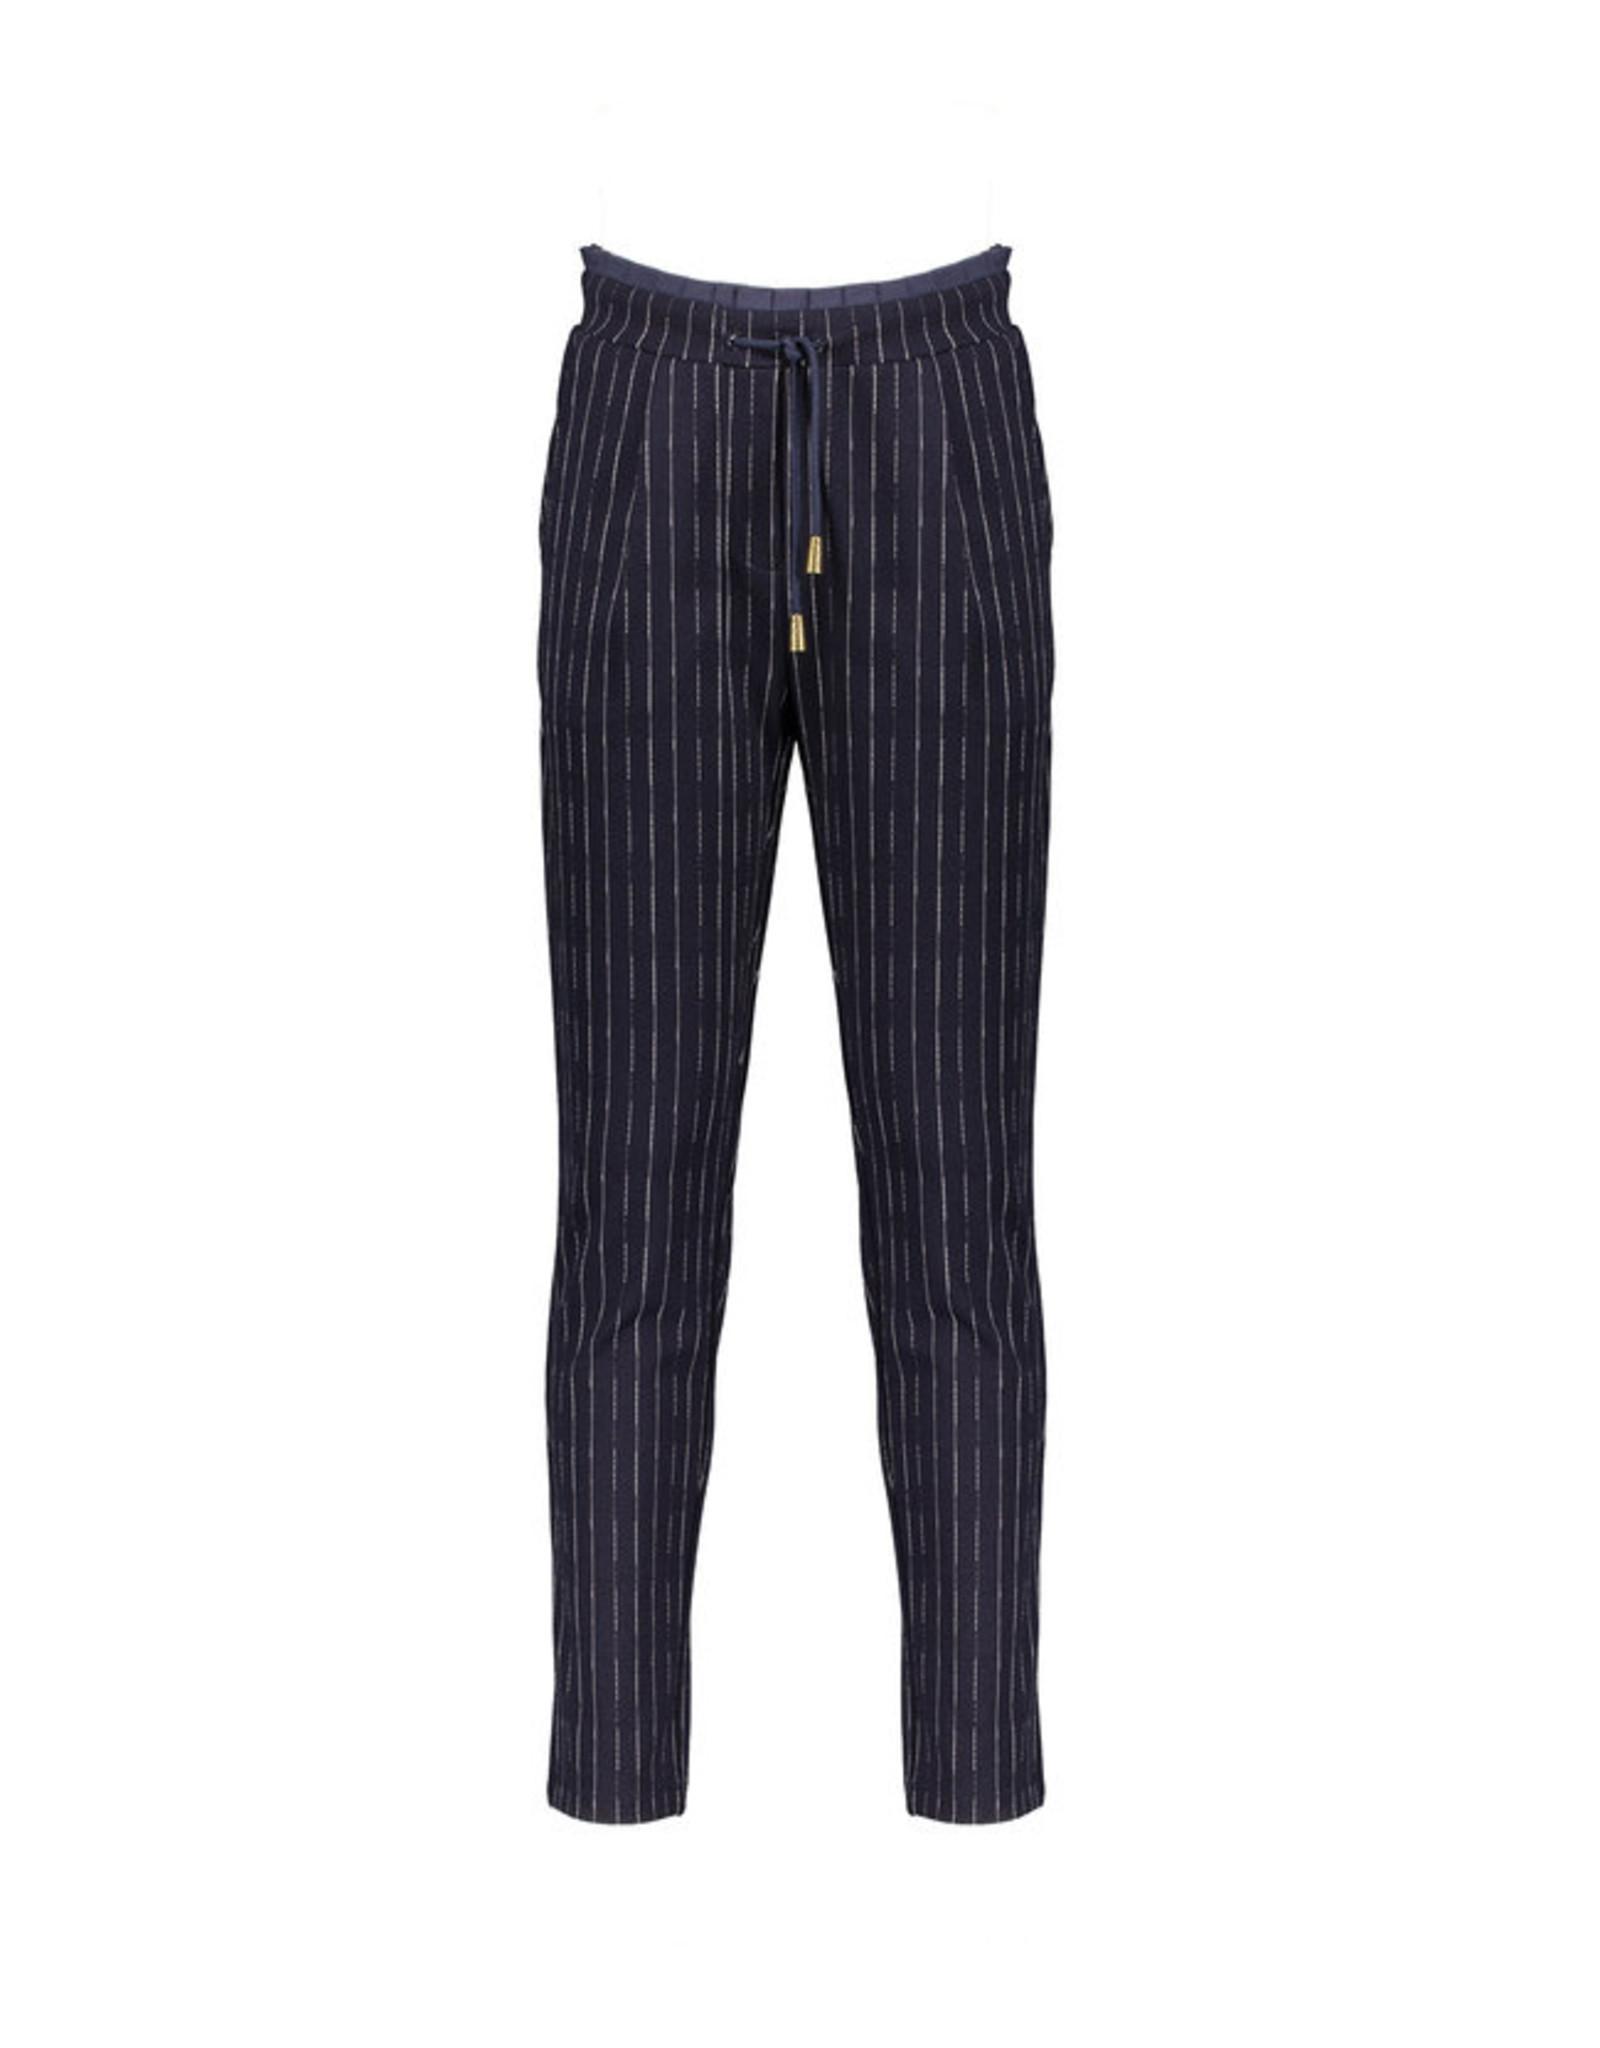 NoBell NoBell pinstripped pants 3600 navy blazer